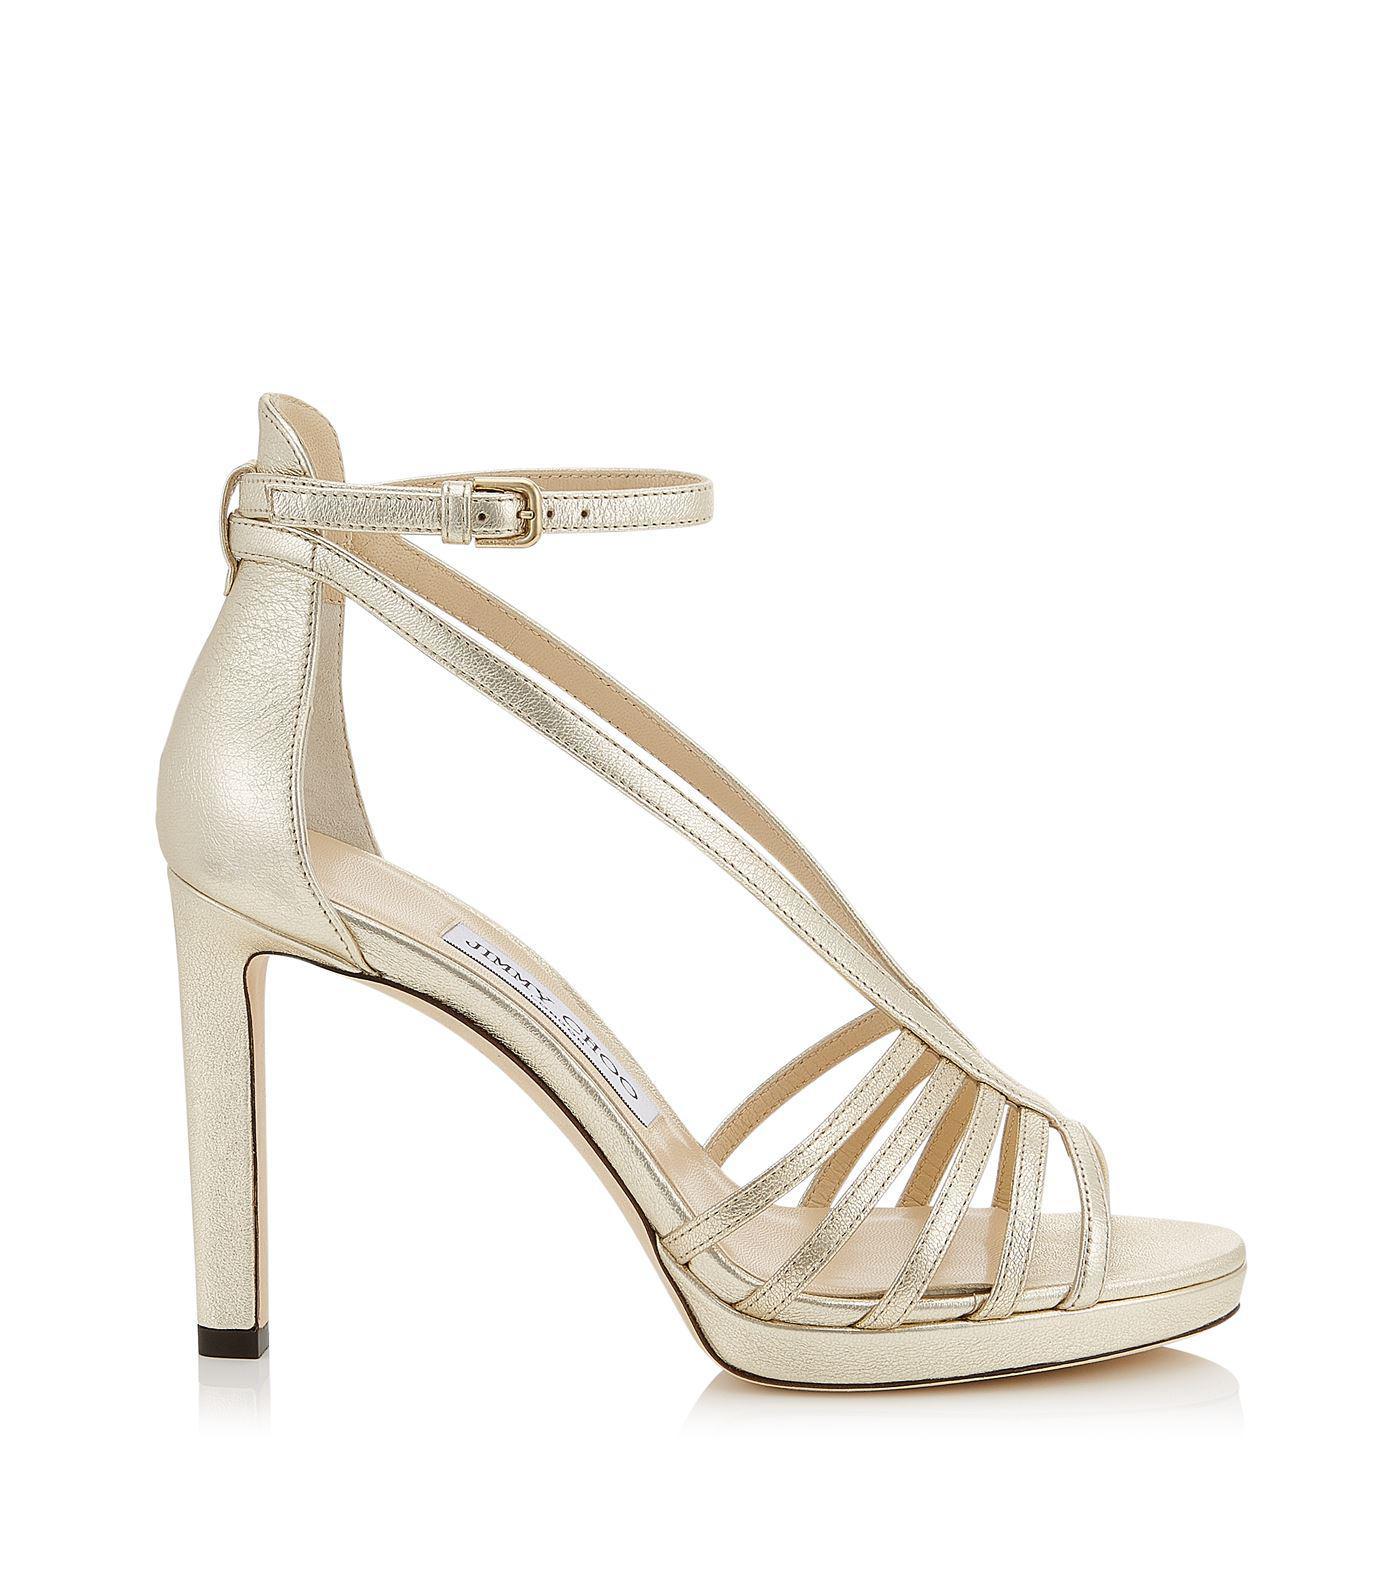 50ca5bb302cf Lyst - Jimmy Choo Leather Federica Sandals 100 in Metallic